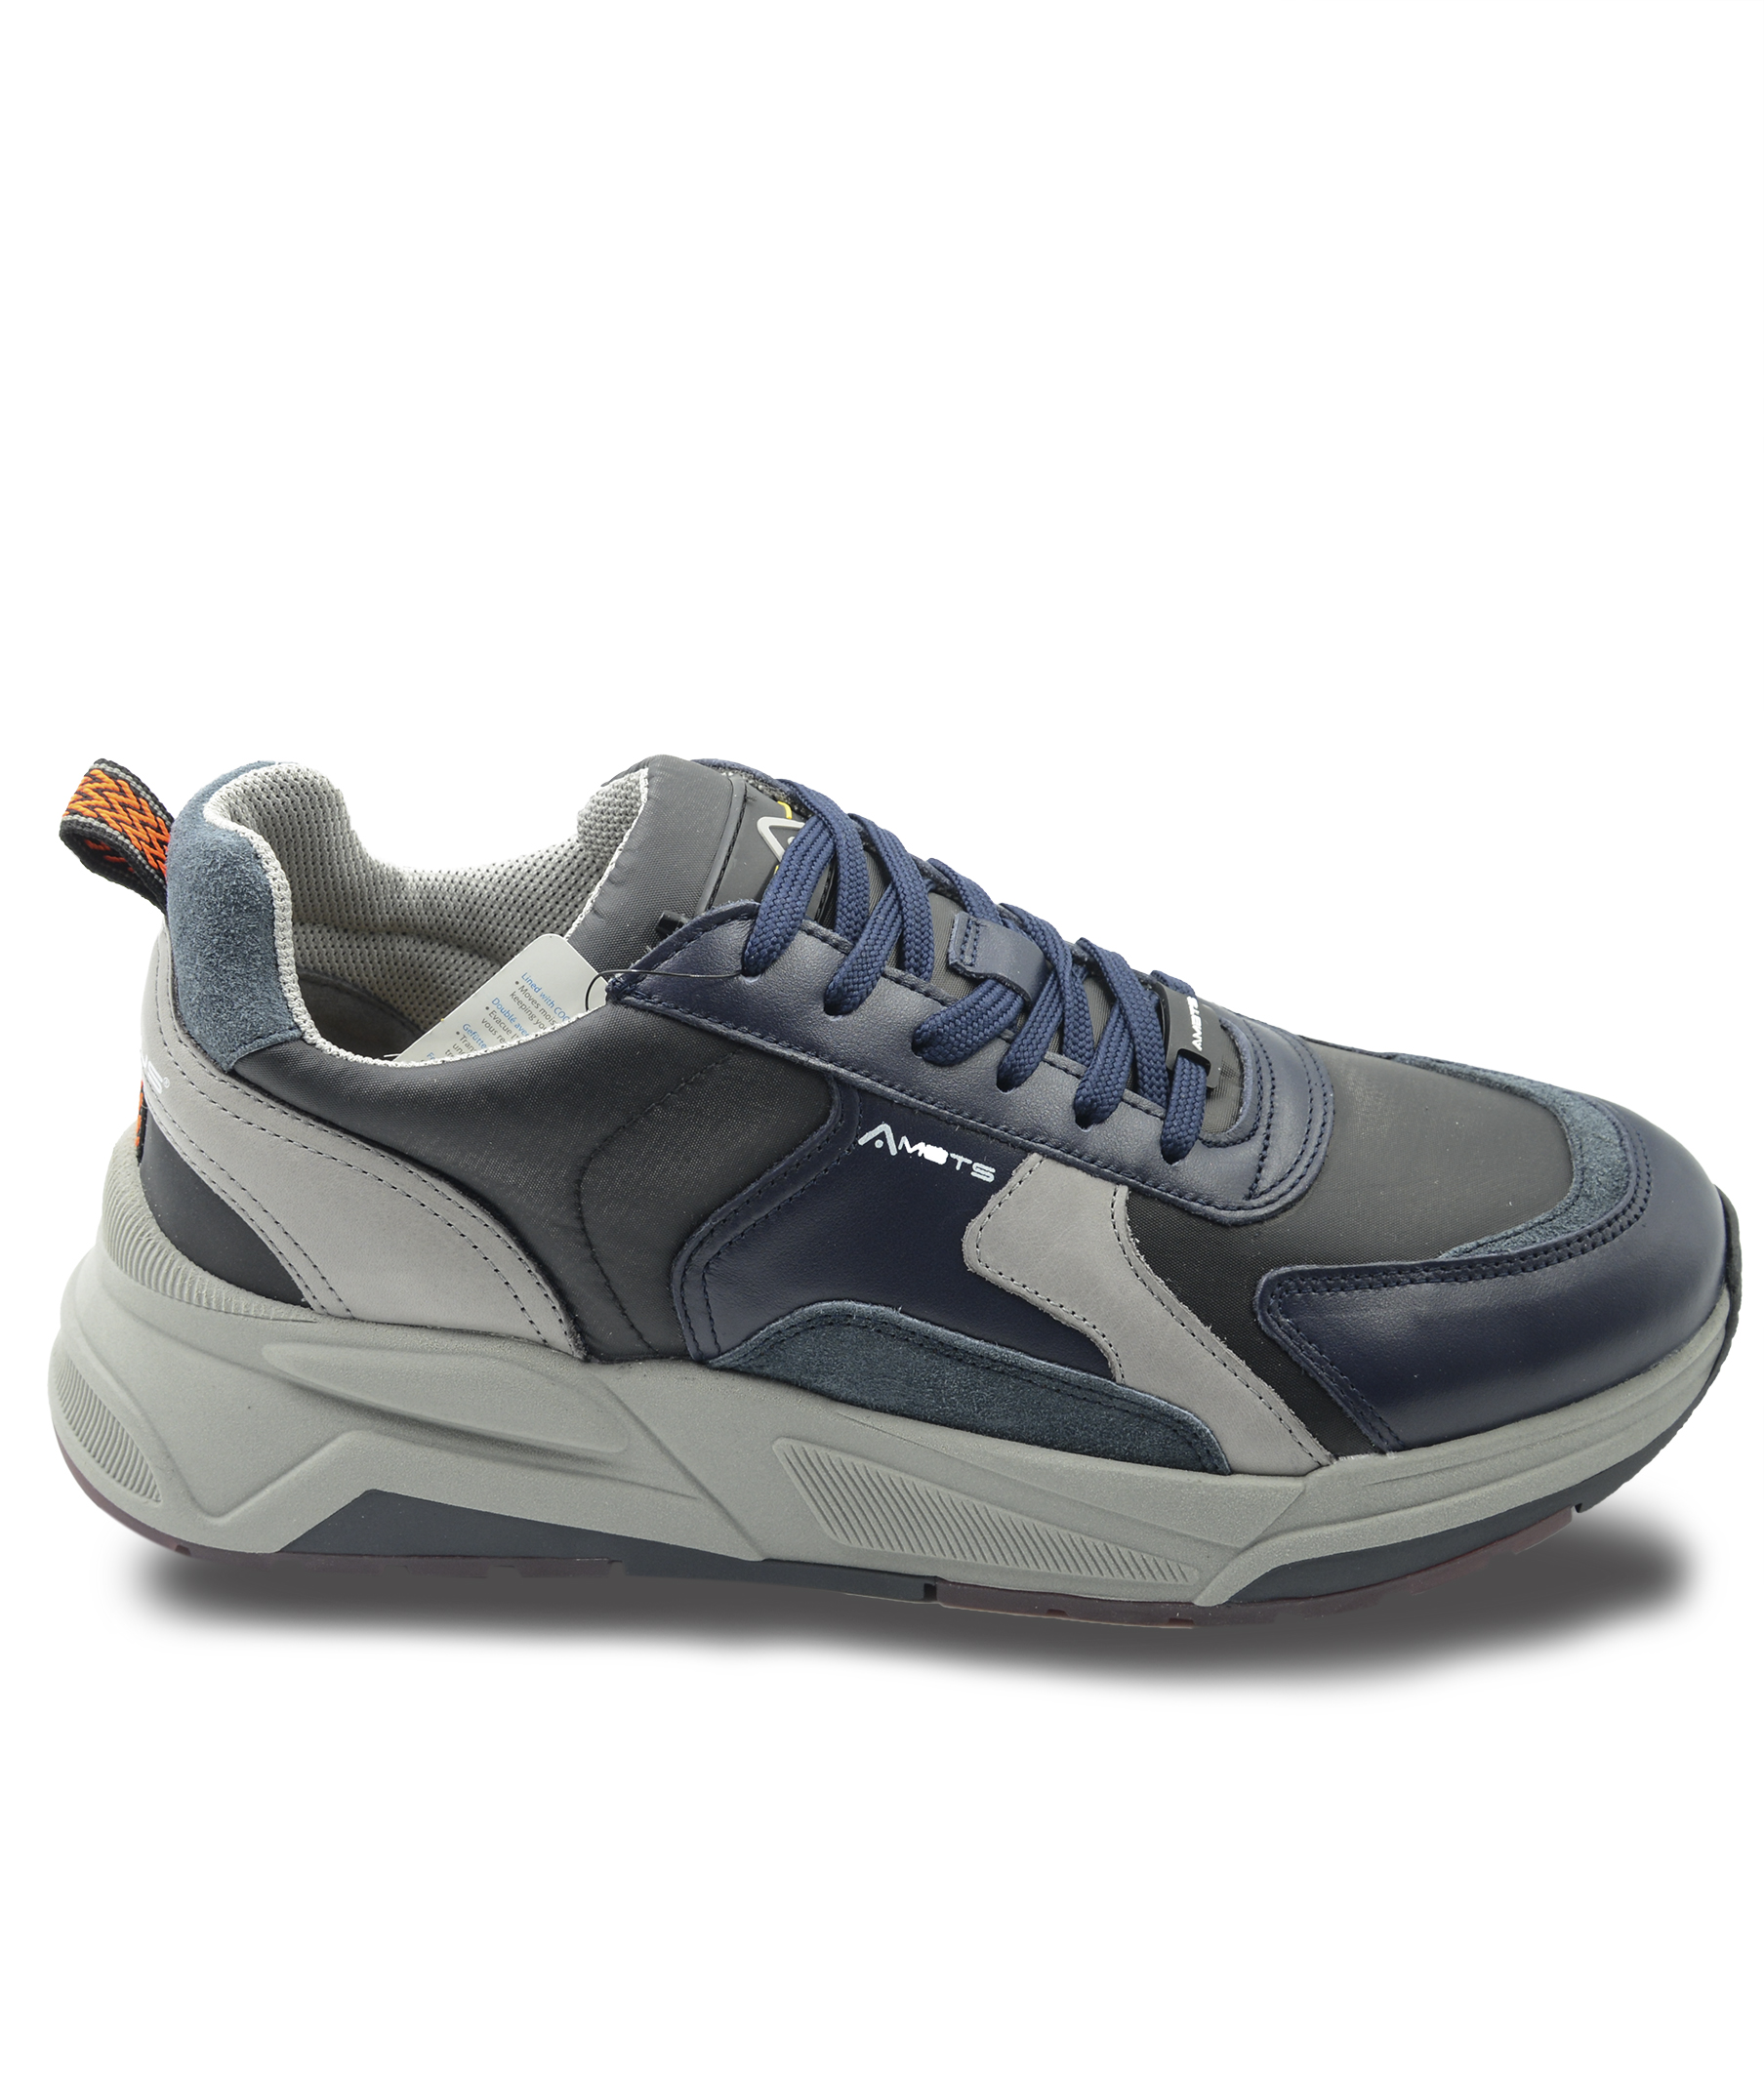 Sneakers Uomo in Pelle Blu Multicolor Ambitious | Sneakers | 10720BLU